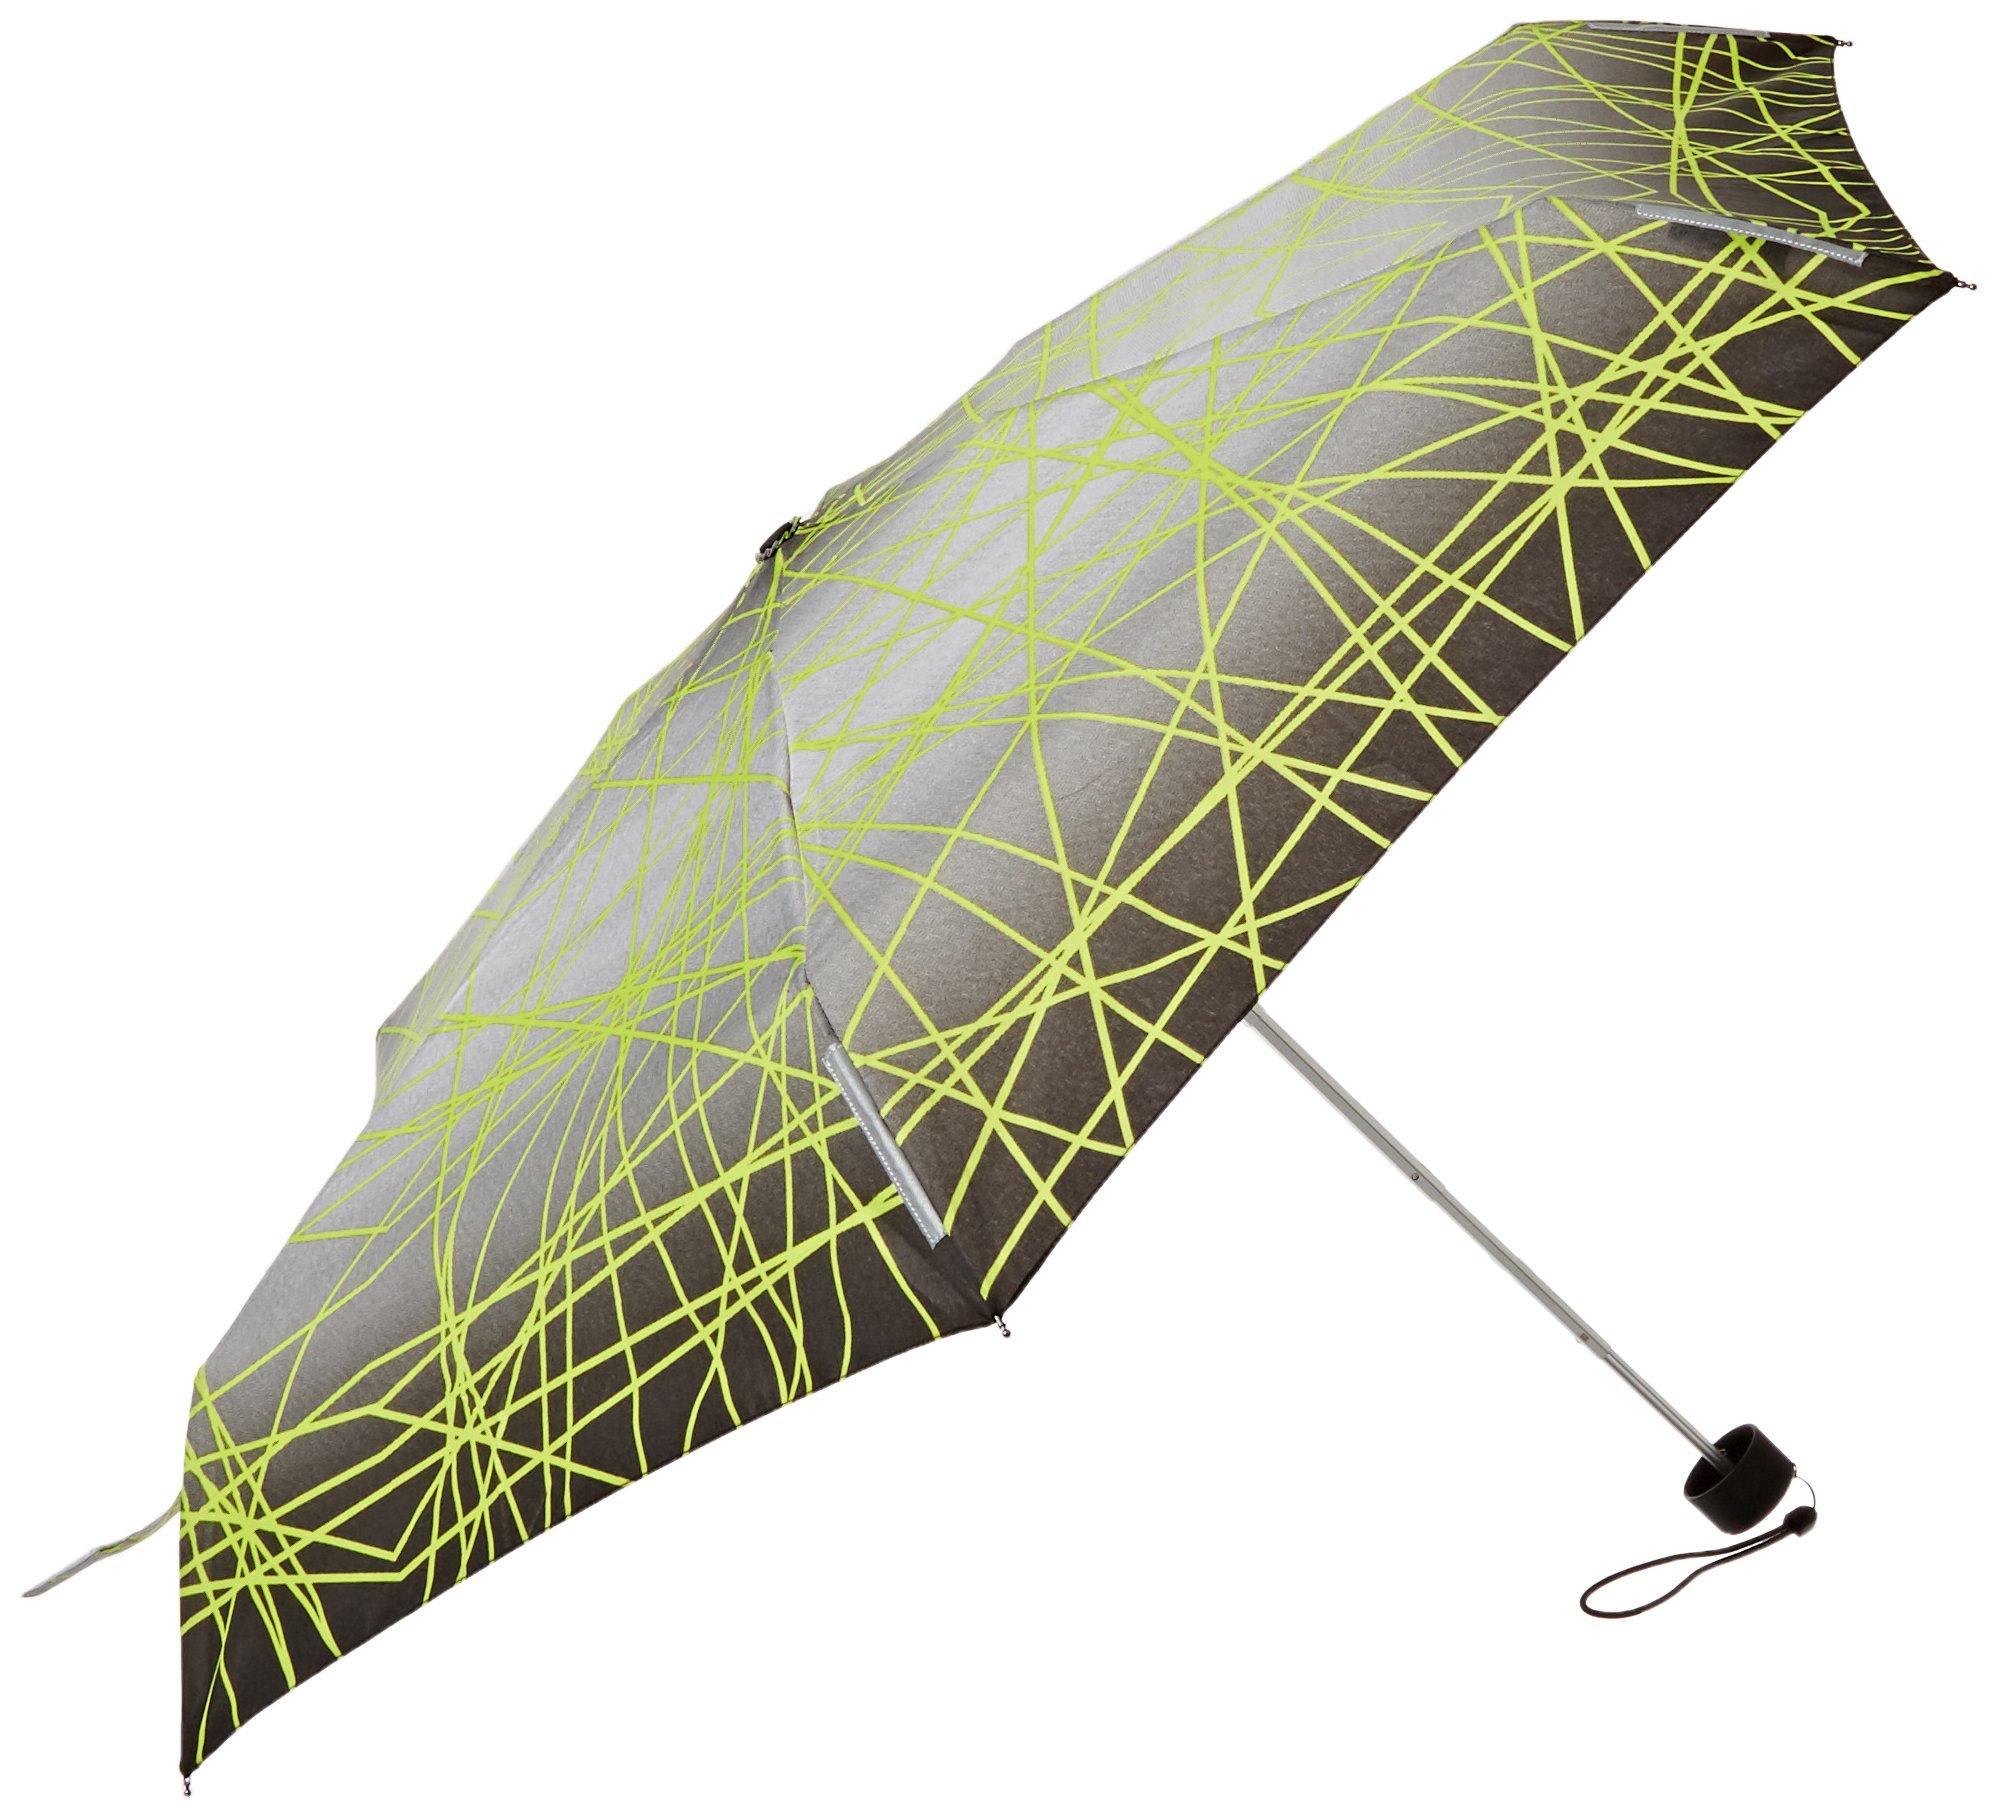 Totes Trx Manual Mini Trekker Umbrella, Strength, One Size